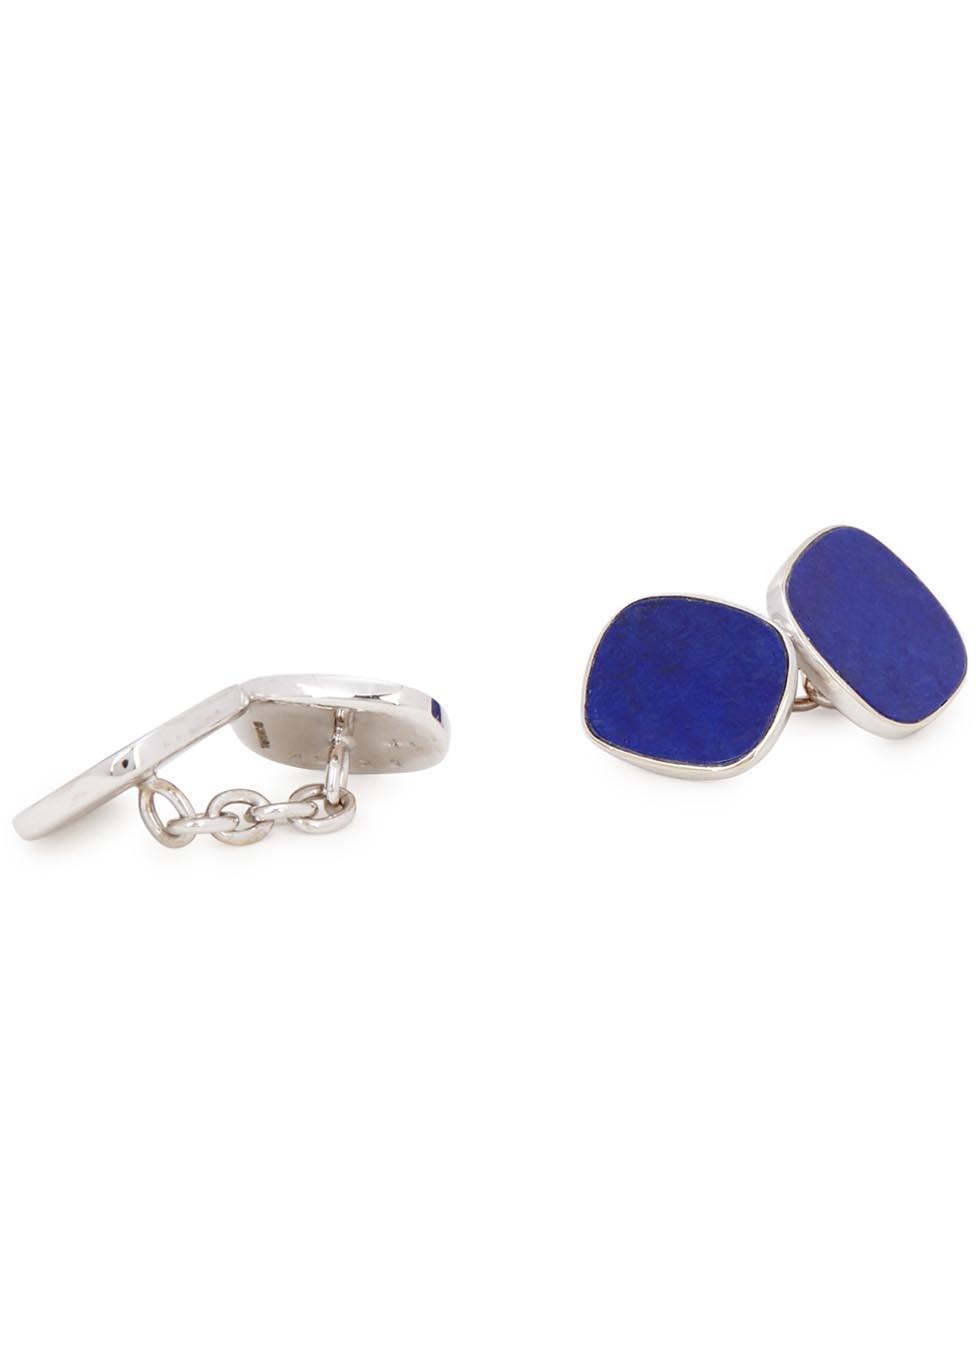 Lapis sterling silver cufflinks - Trianon